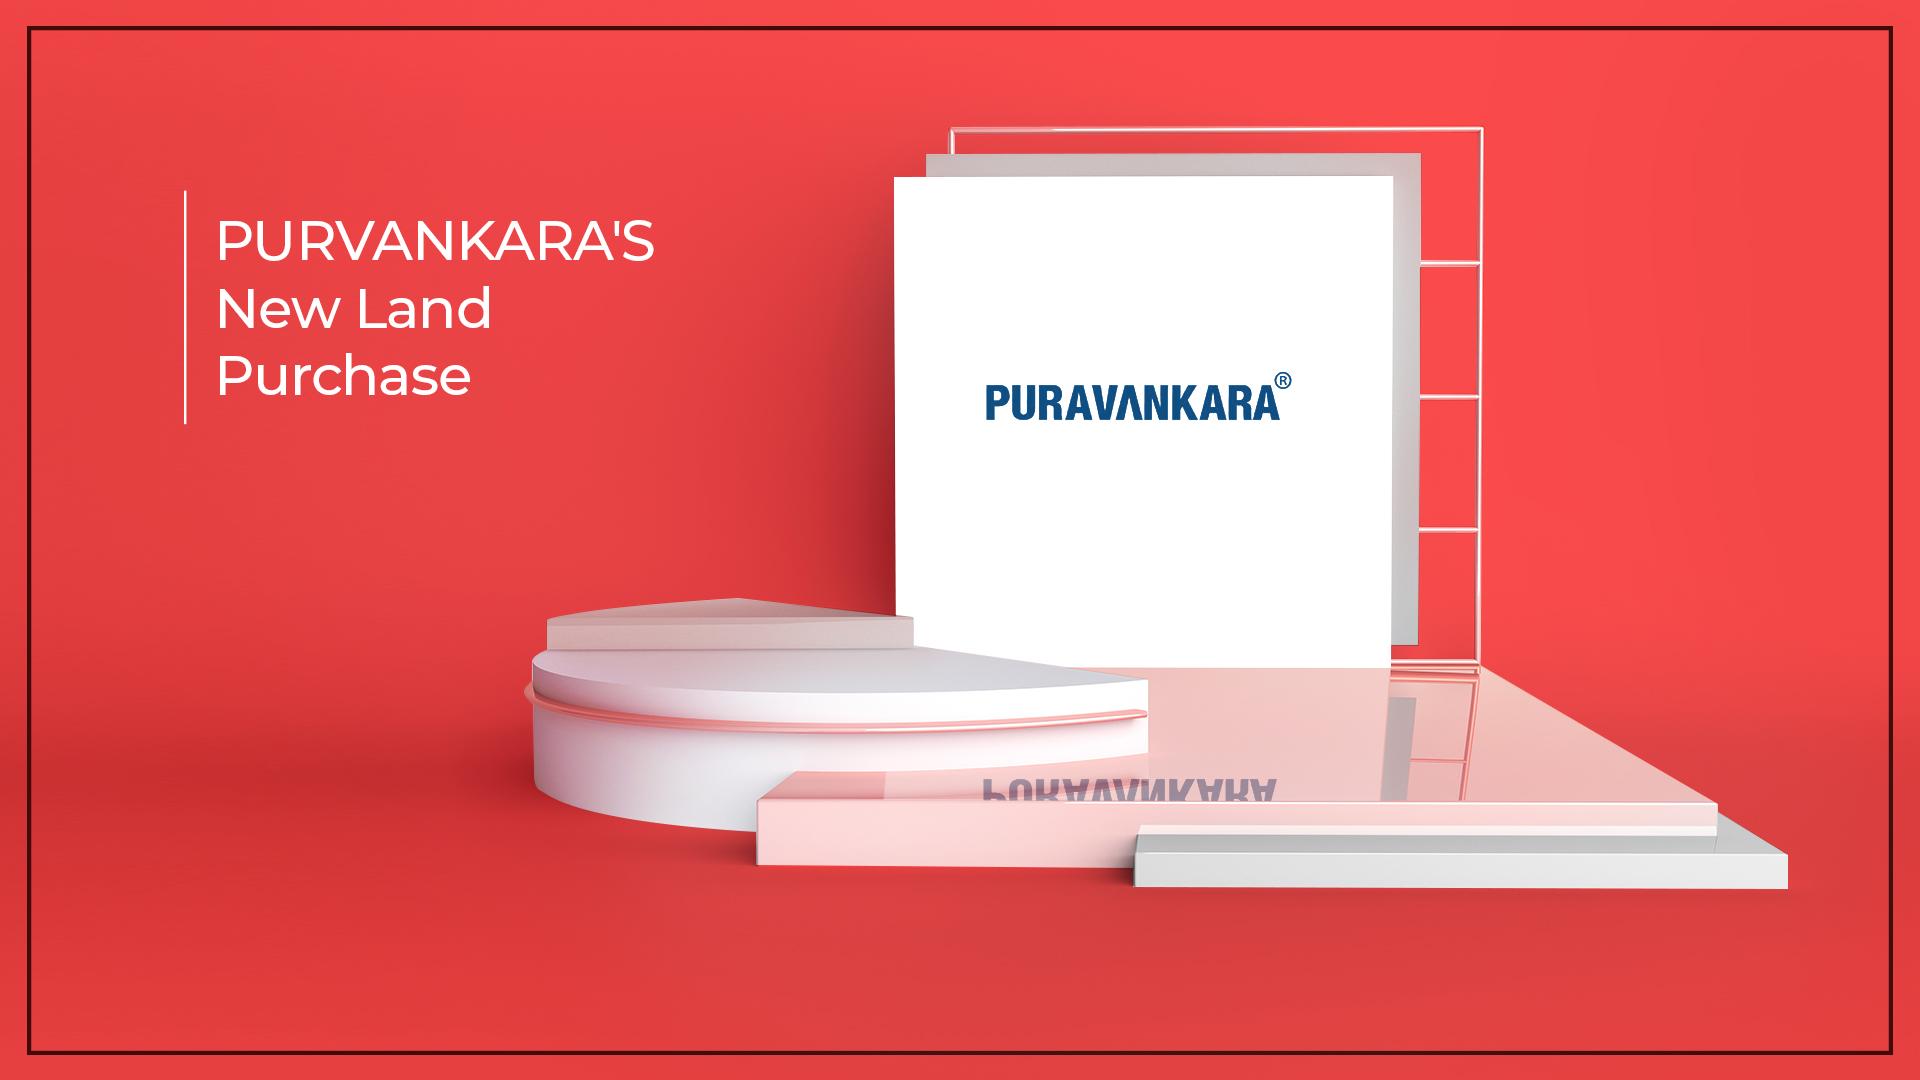 Puravankara to purchase a land parcel worth ₹320 crores